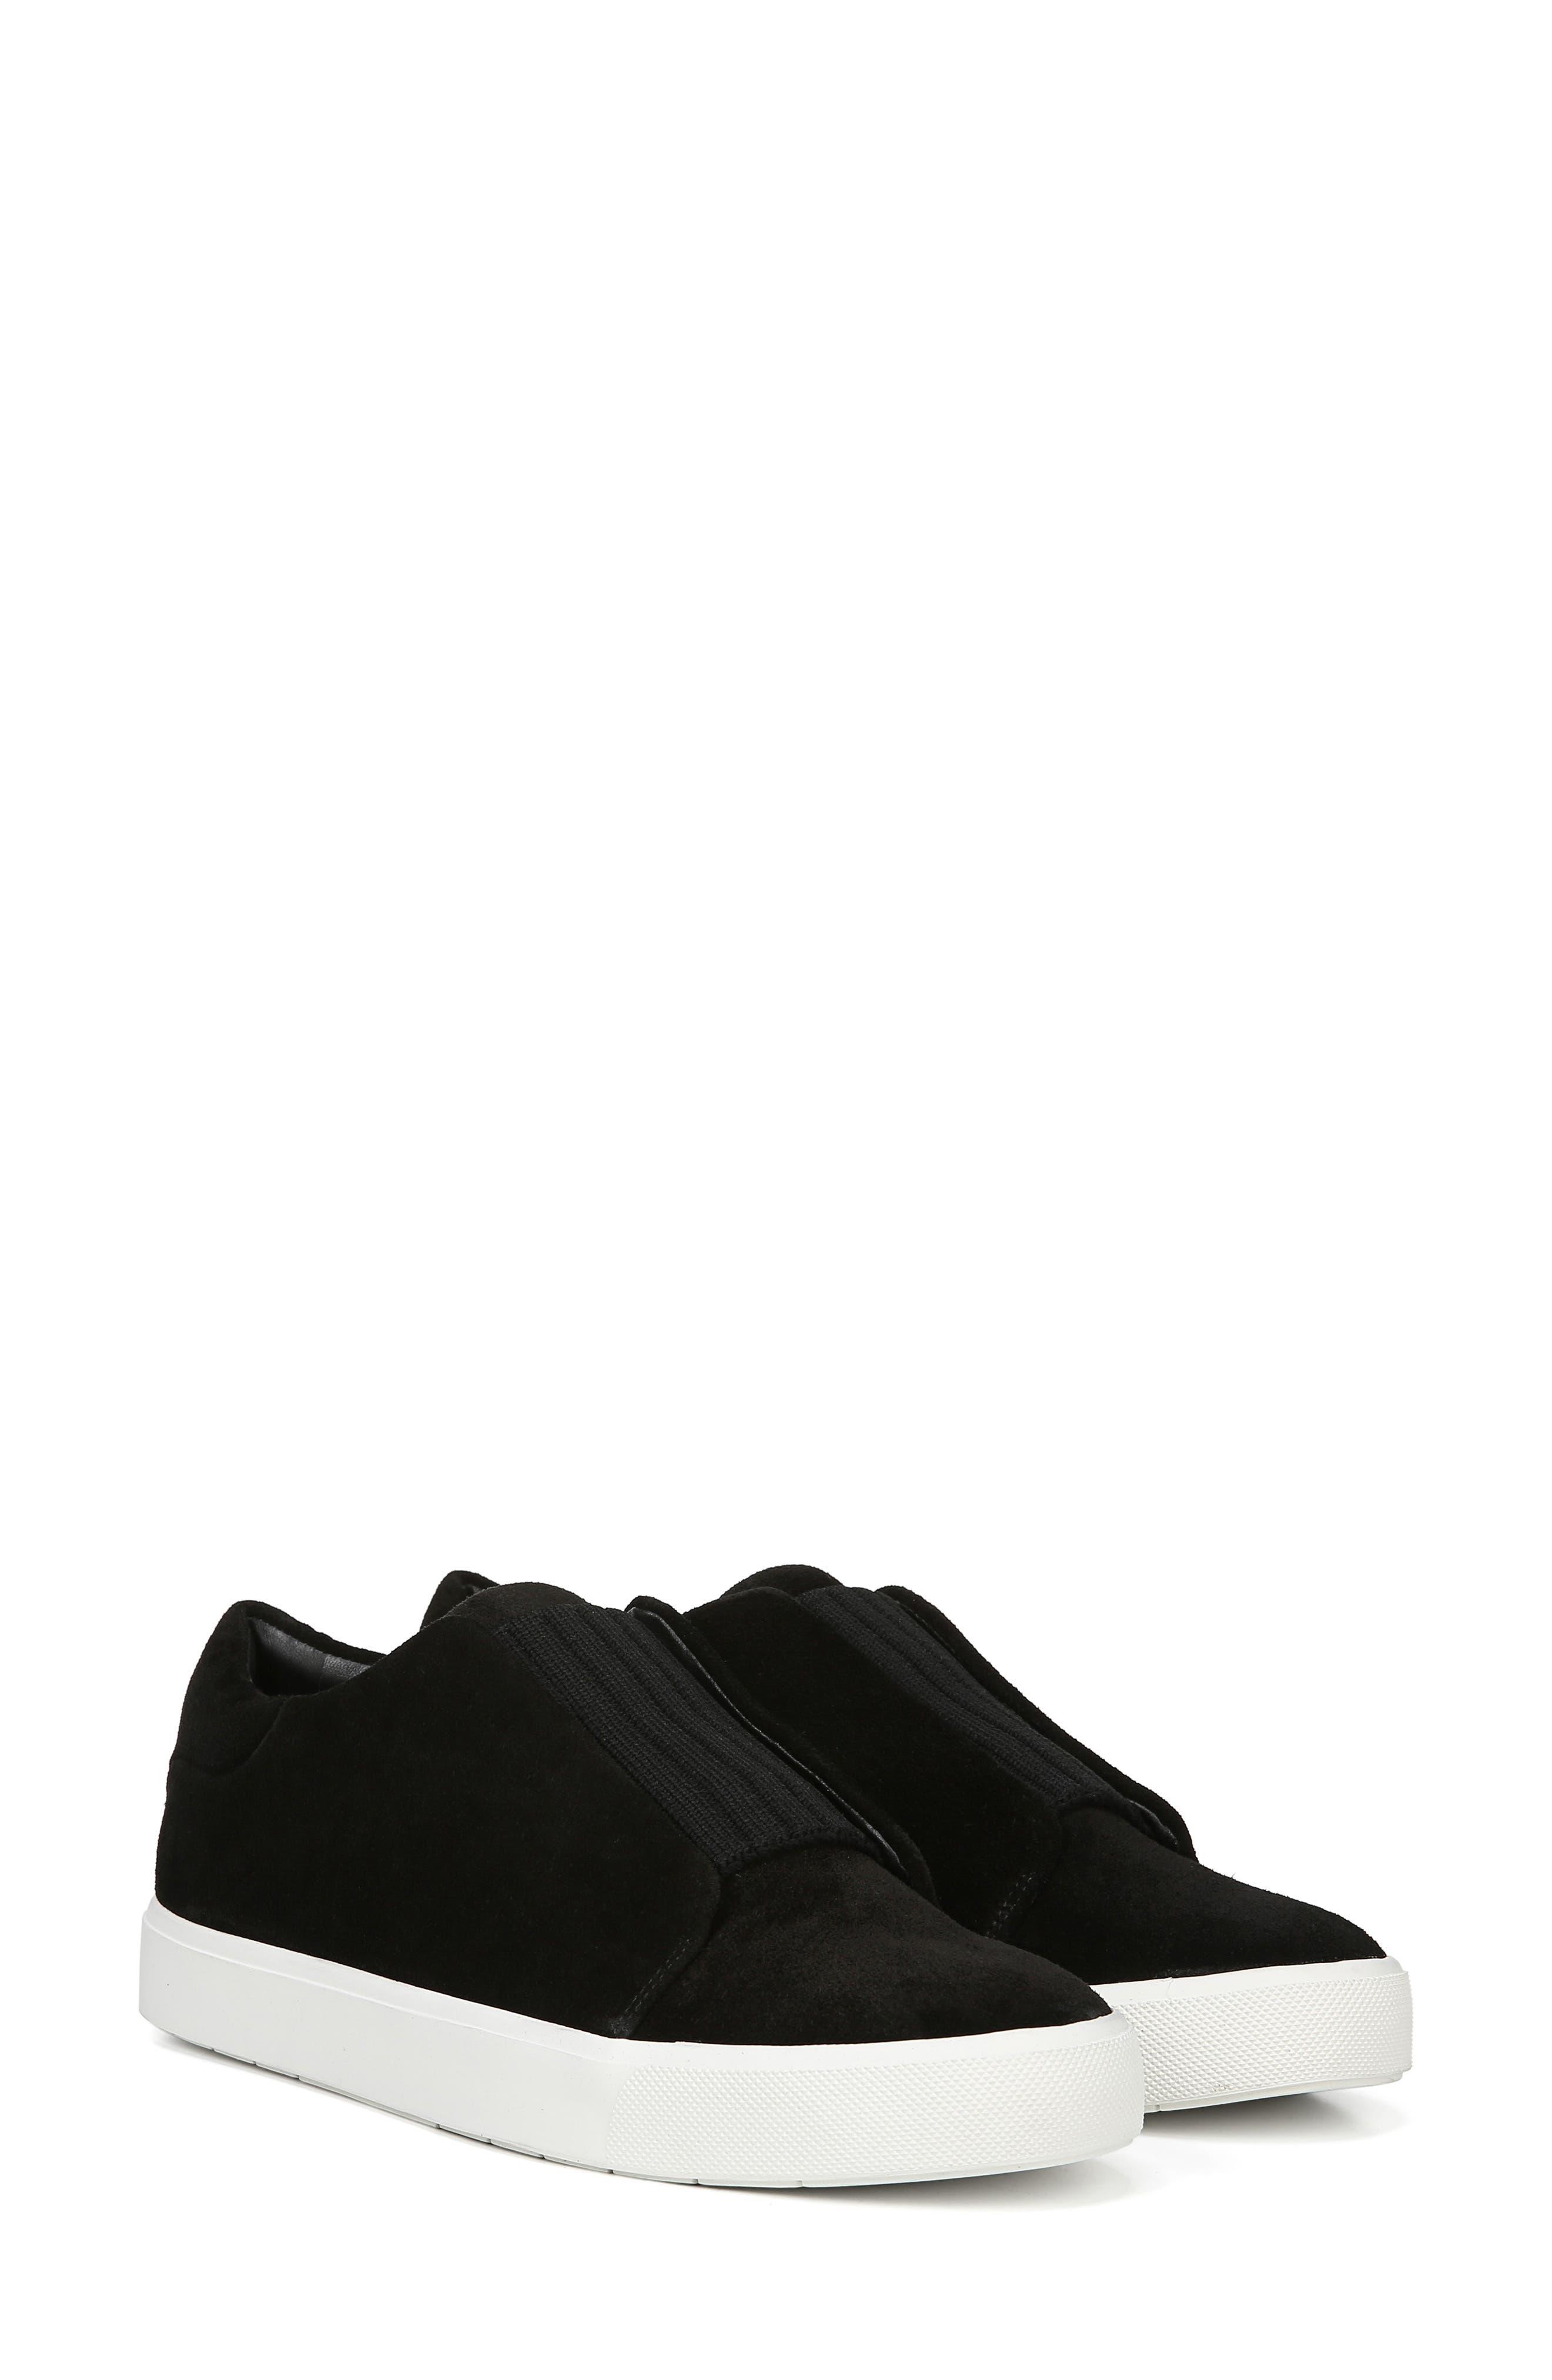 Cantara Slip-On Sneaker,                             Alternate thumbnail 9, color,                             BLACK SUEDE